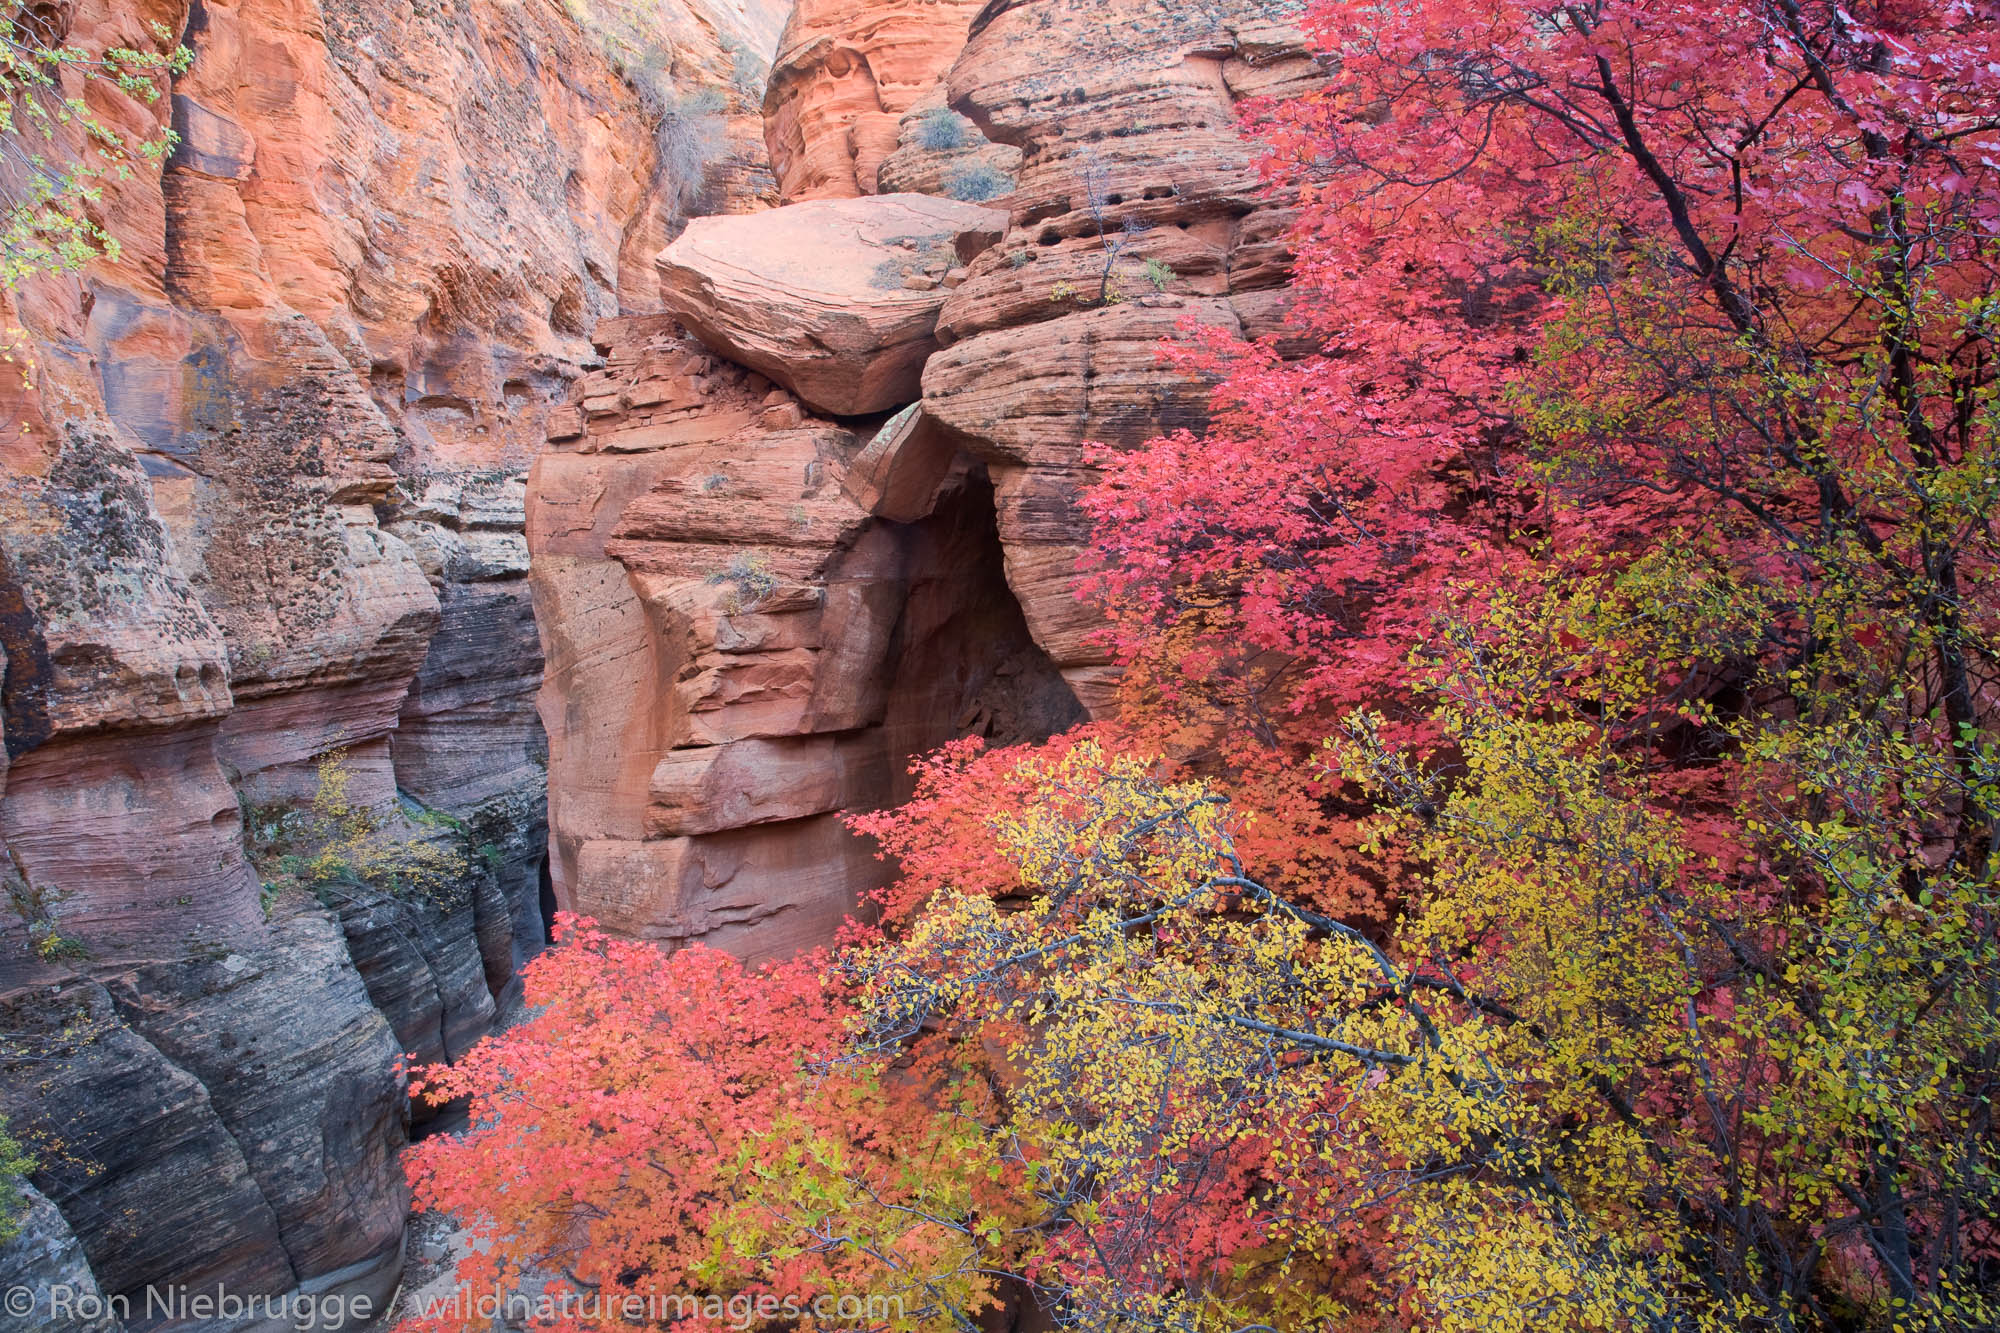 Autumn colors in Zion National Park, Utah.